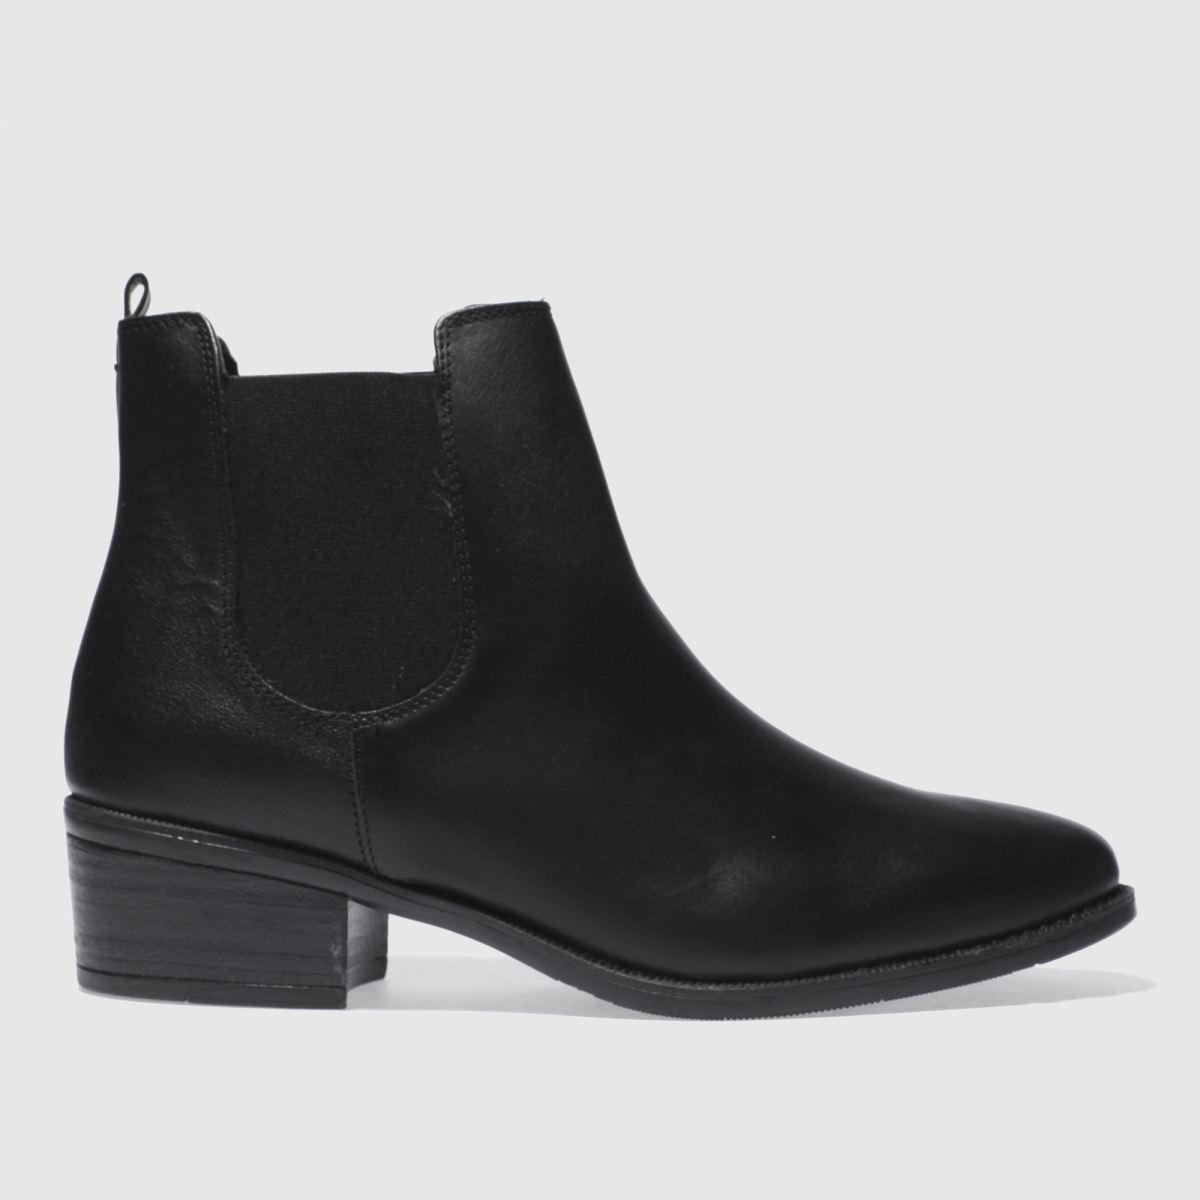 Schuh Black Vice Boots